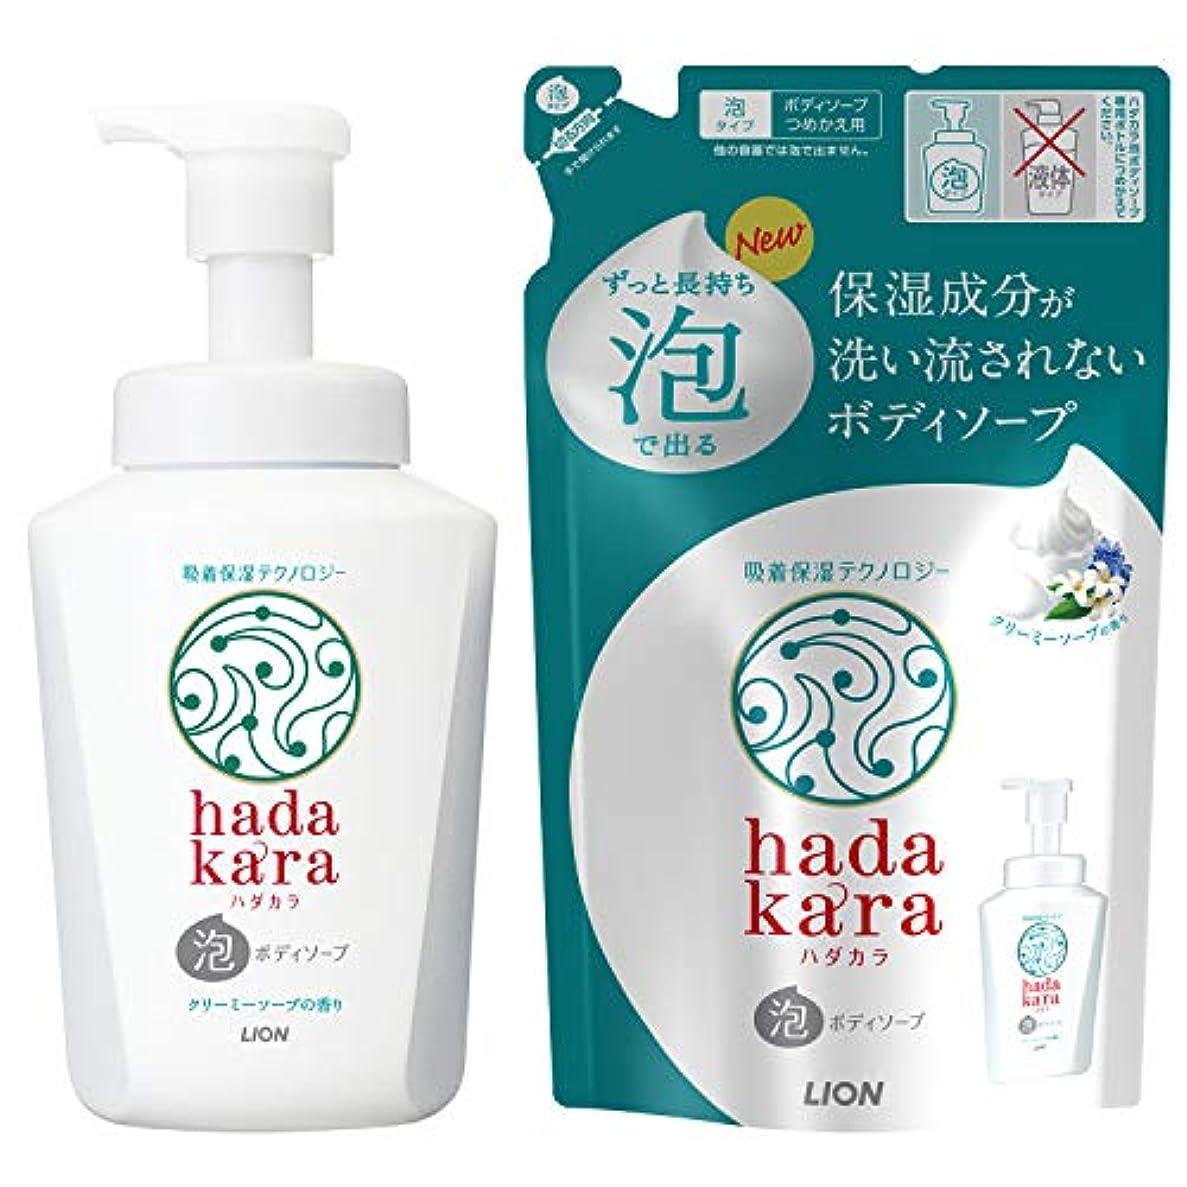 hadakara(ハダカラ) ボディソープ 泡タイプ クリーミーソープの香り 本体550ml+詰替440ml